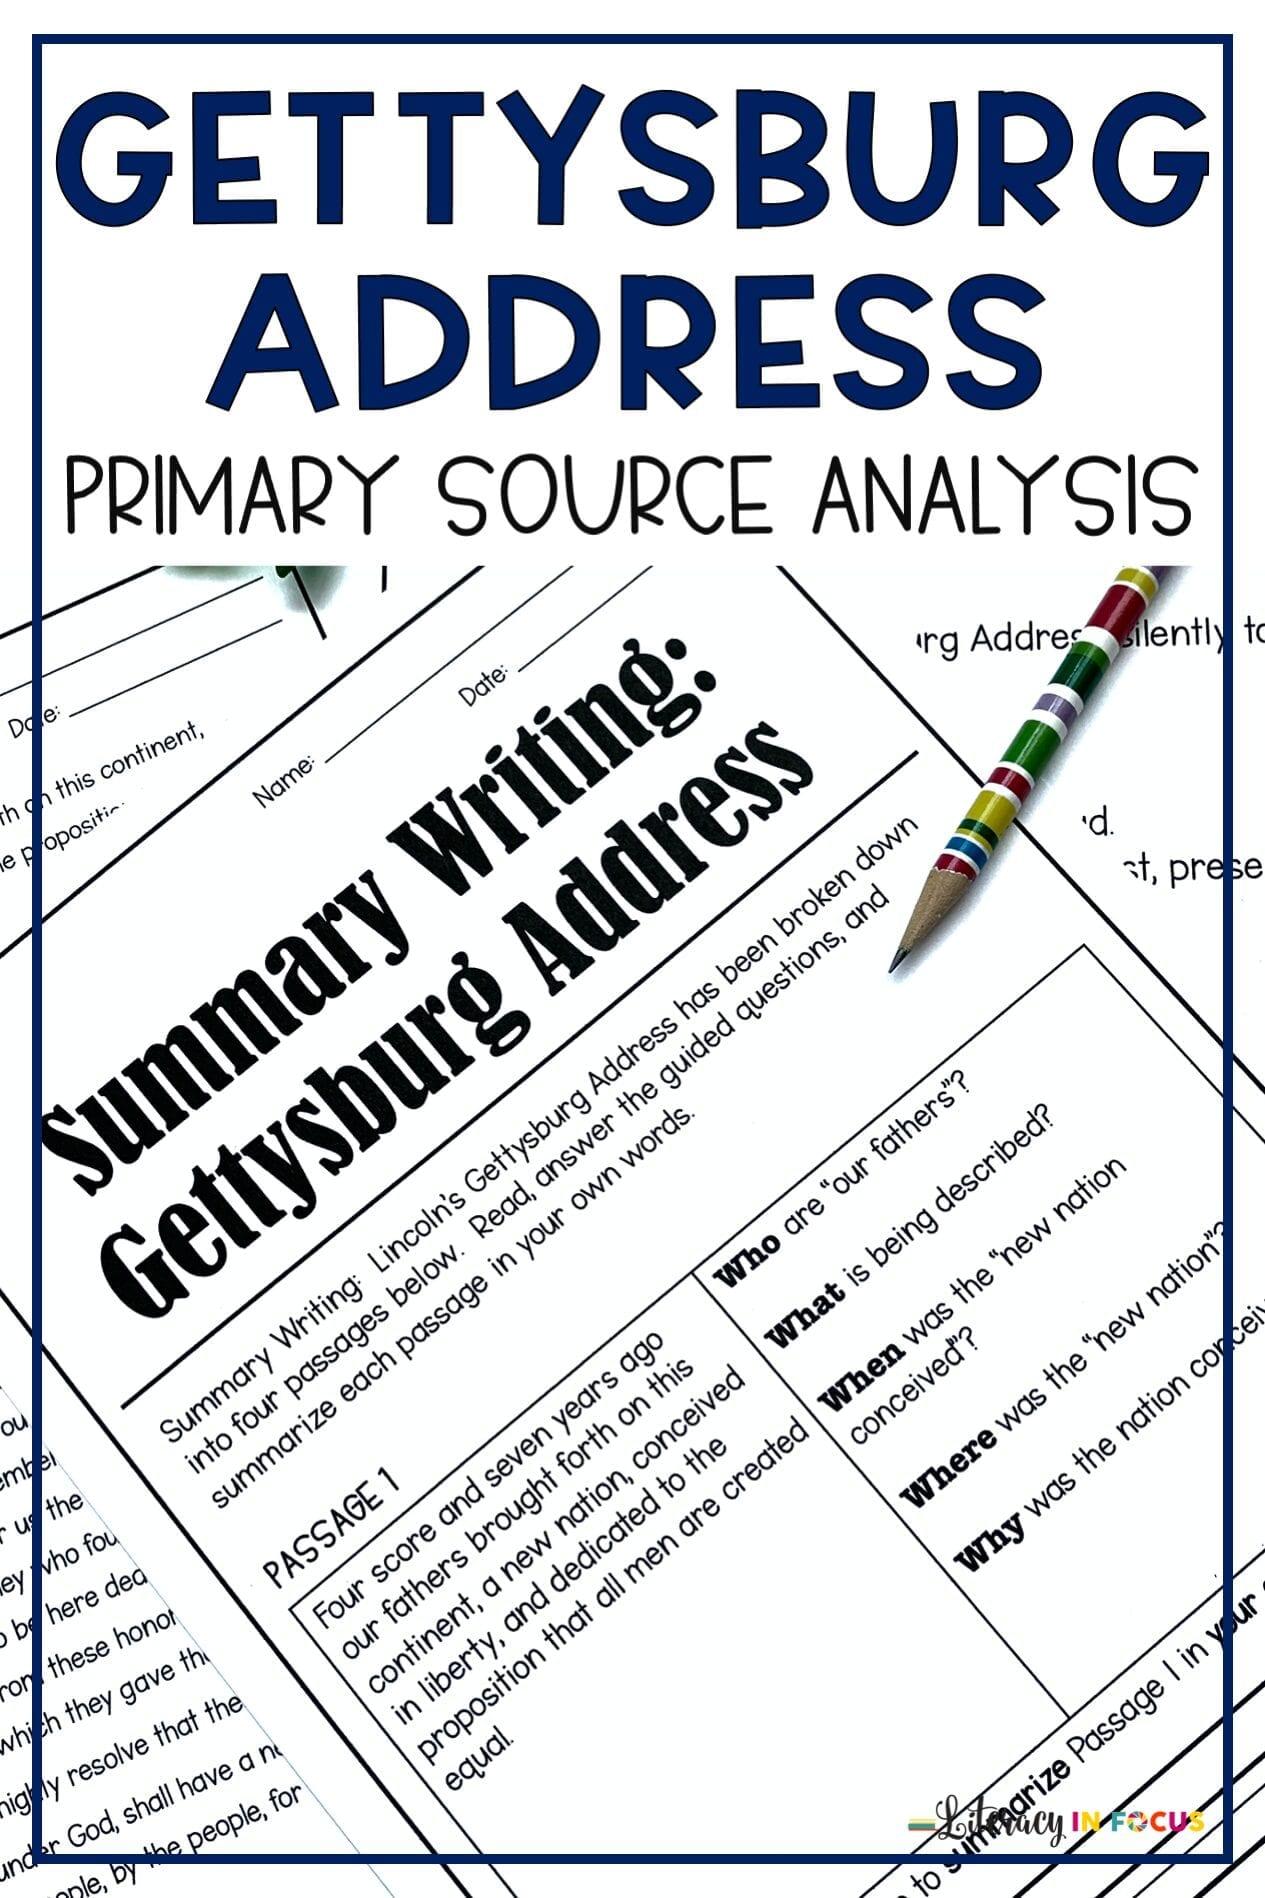 Gettysburg Address Primary Source Analysis